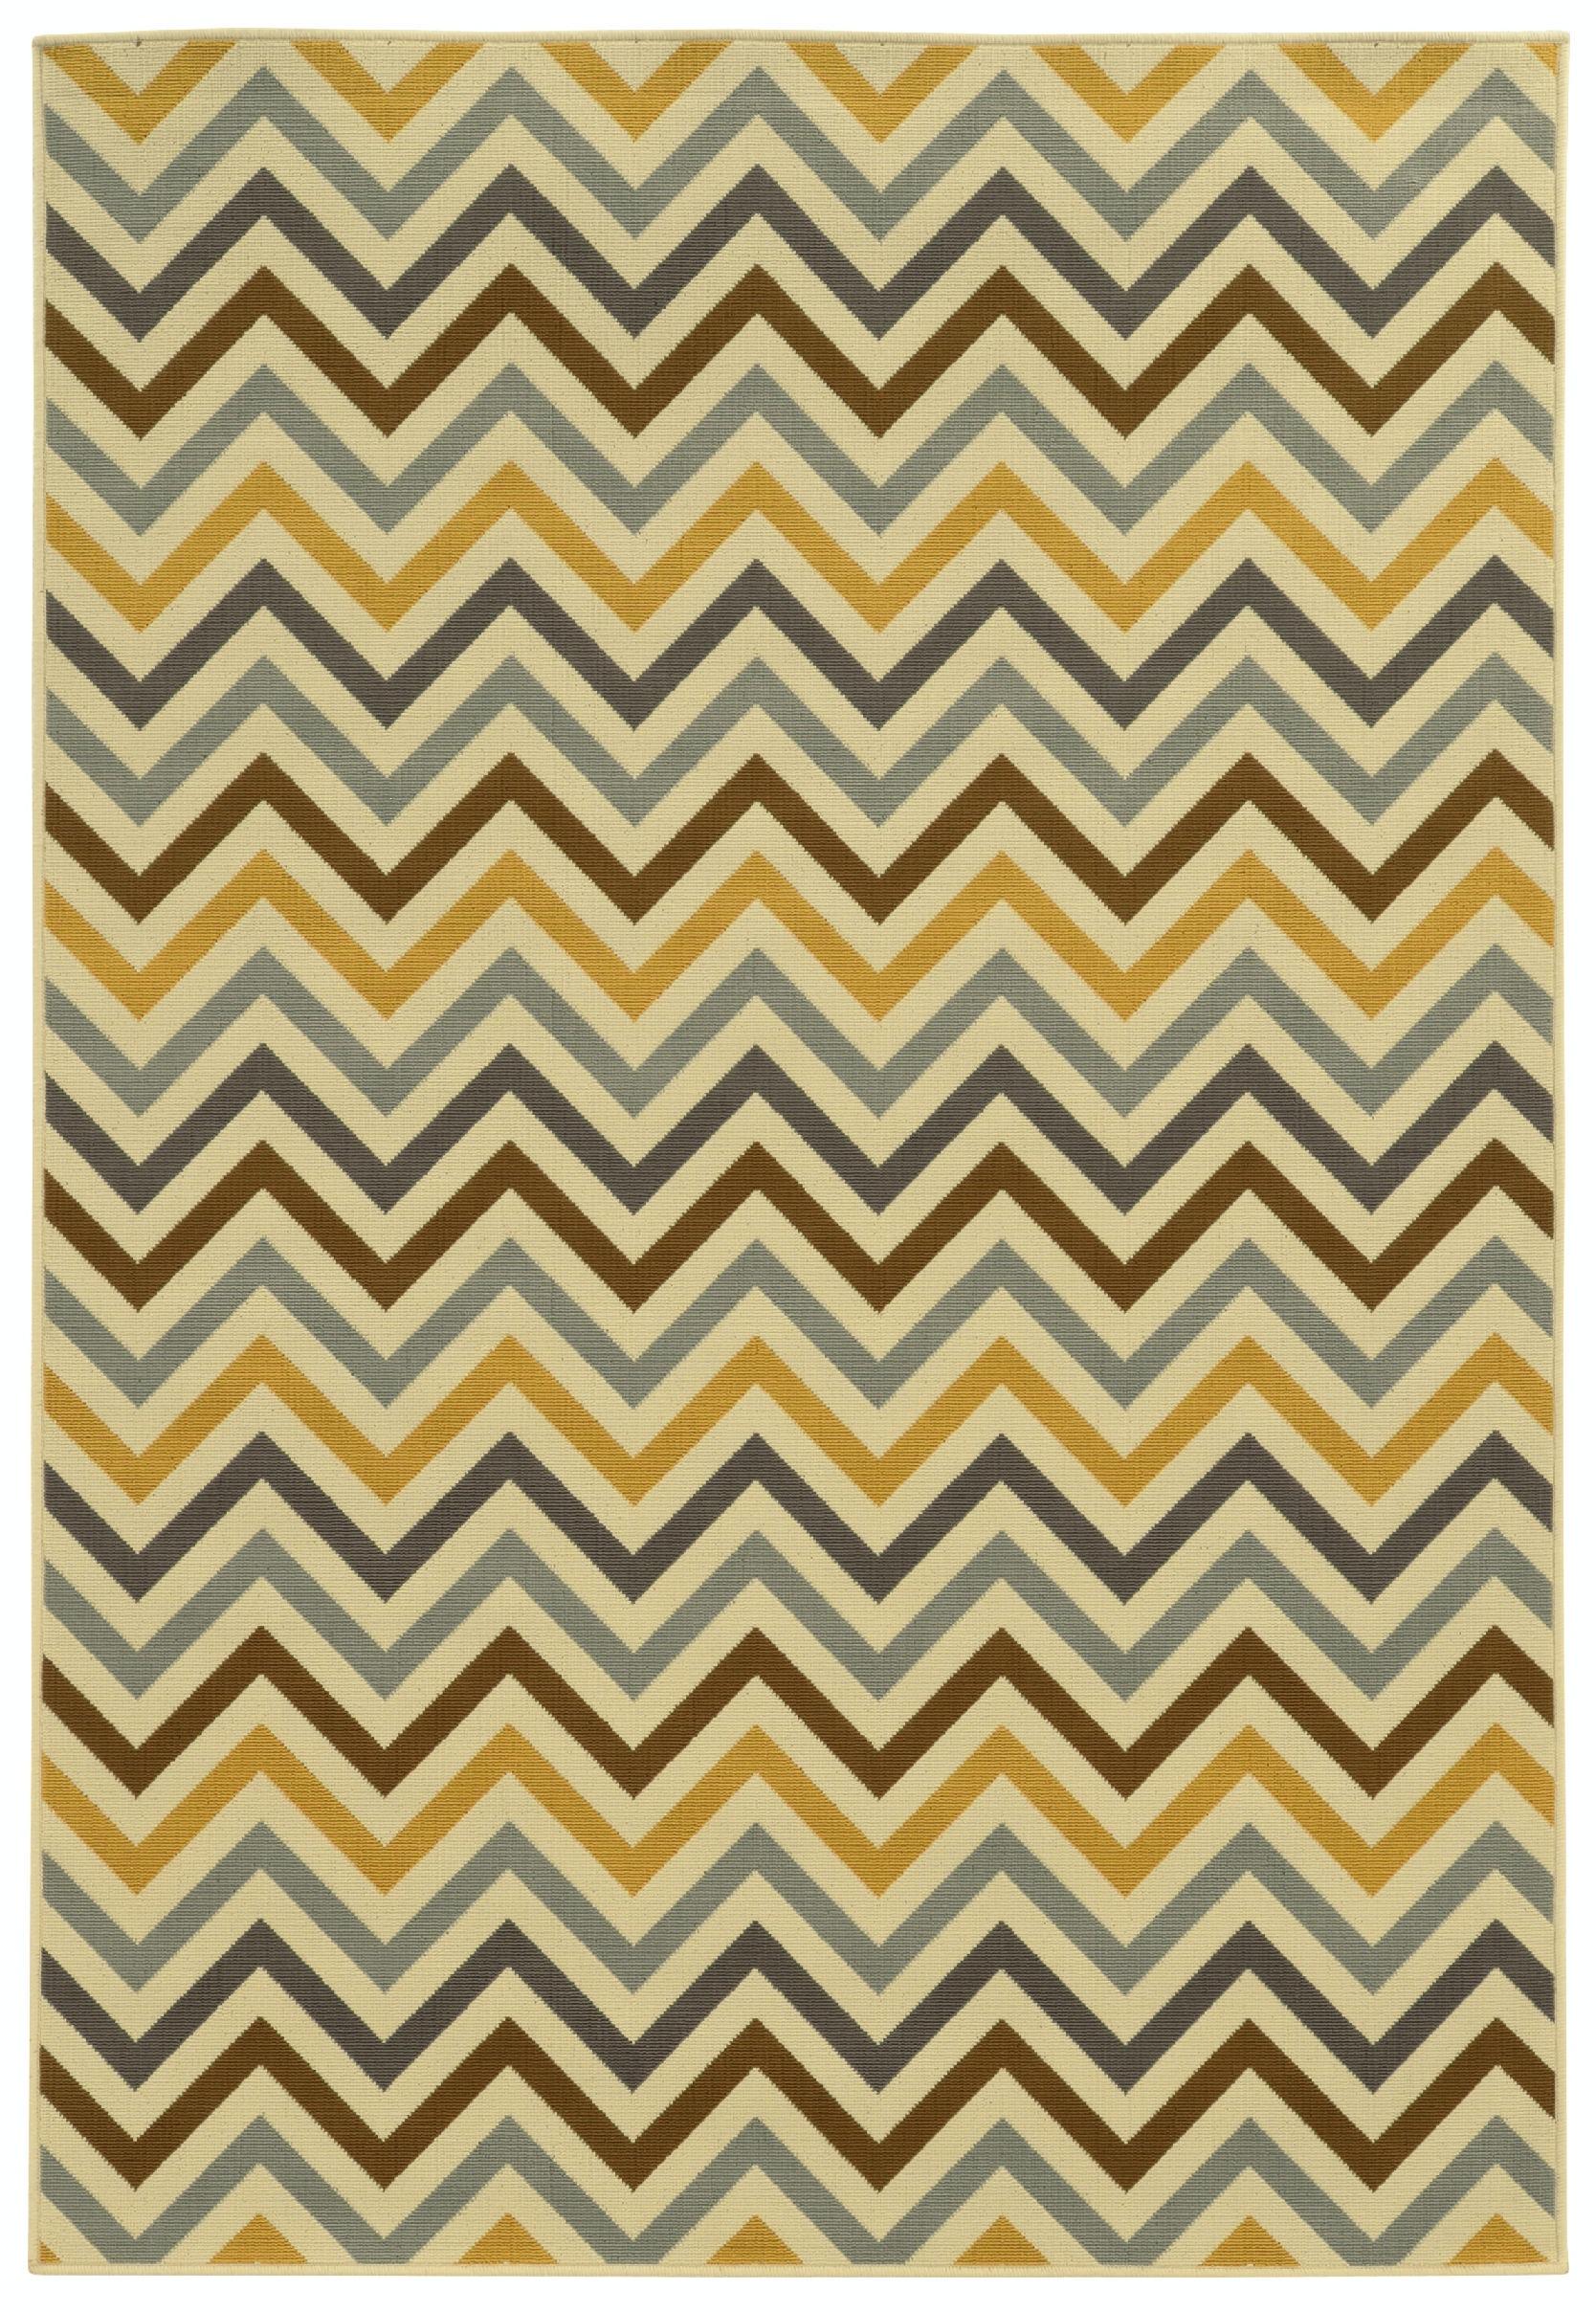 Oriental Weavers Floor Coverings Riviera 4593A Rug RVA 4593A At Abide  Furniture